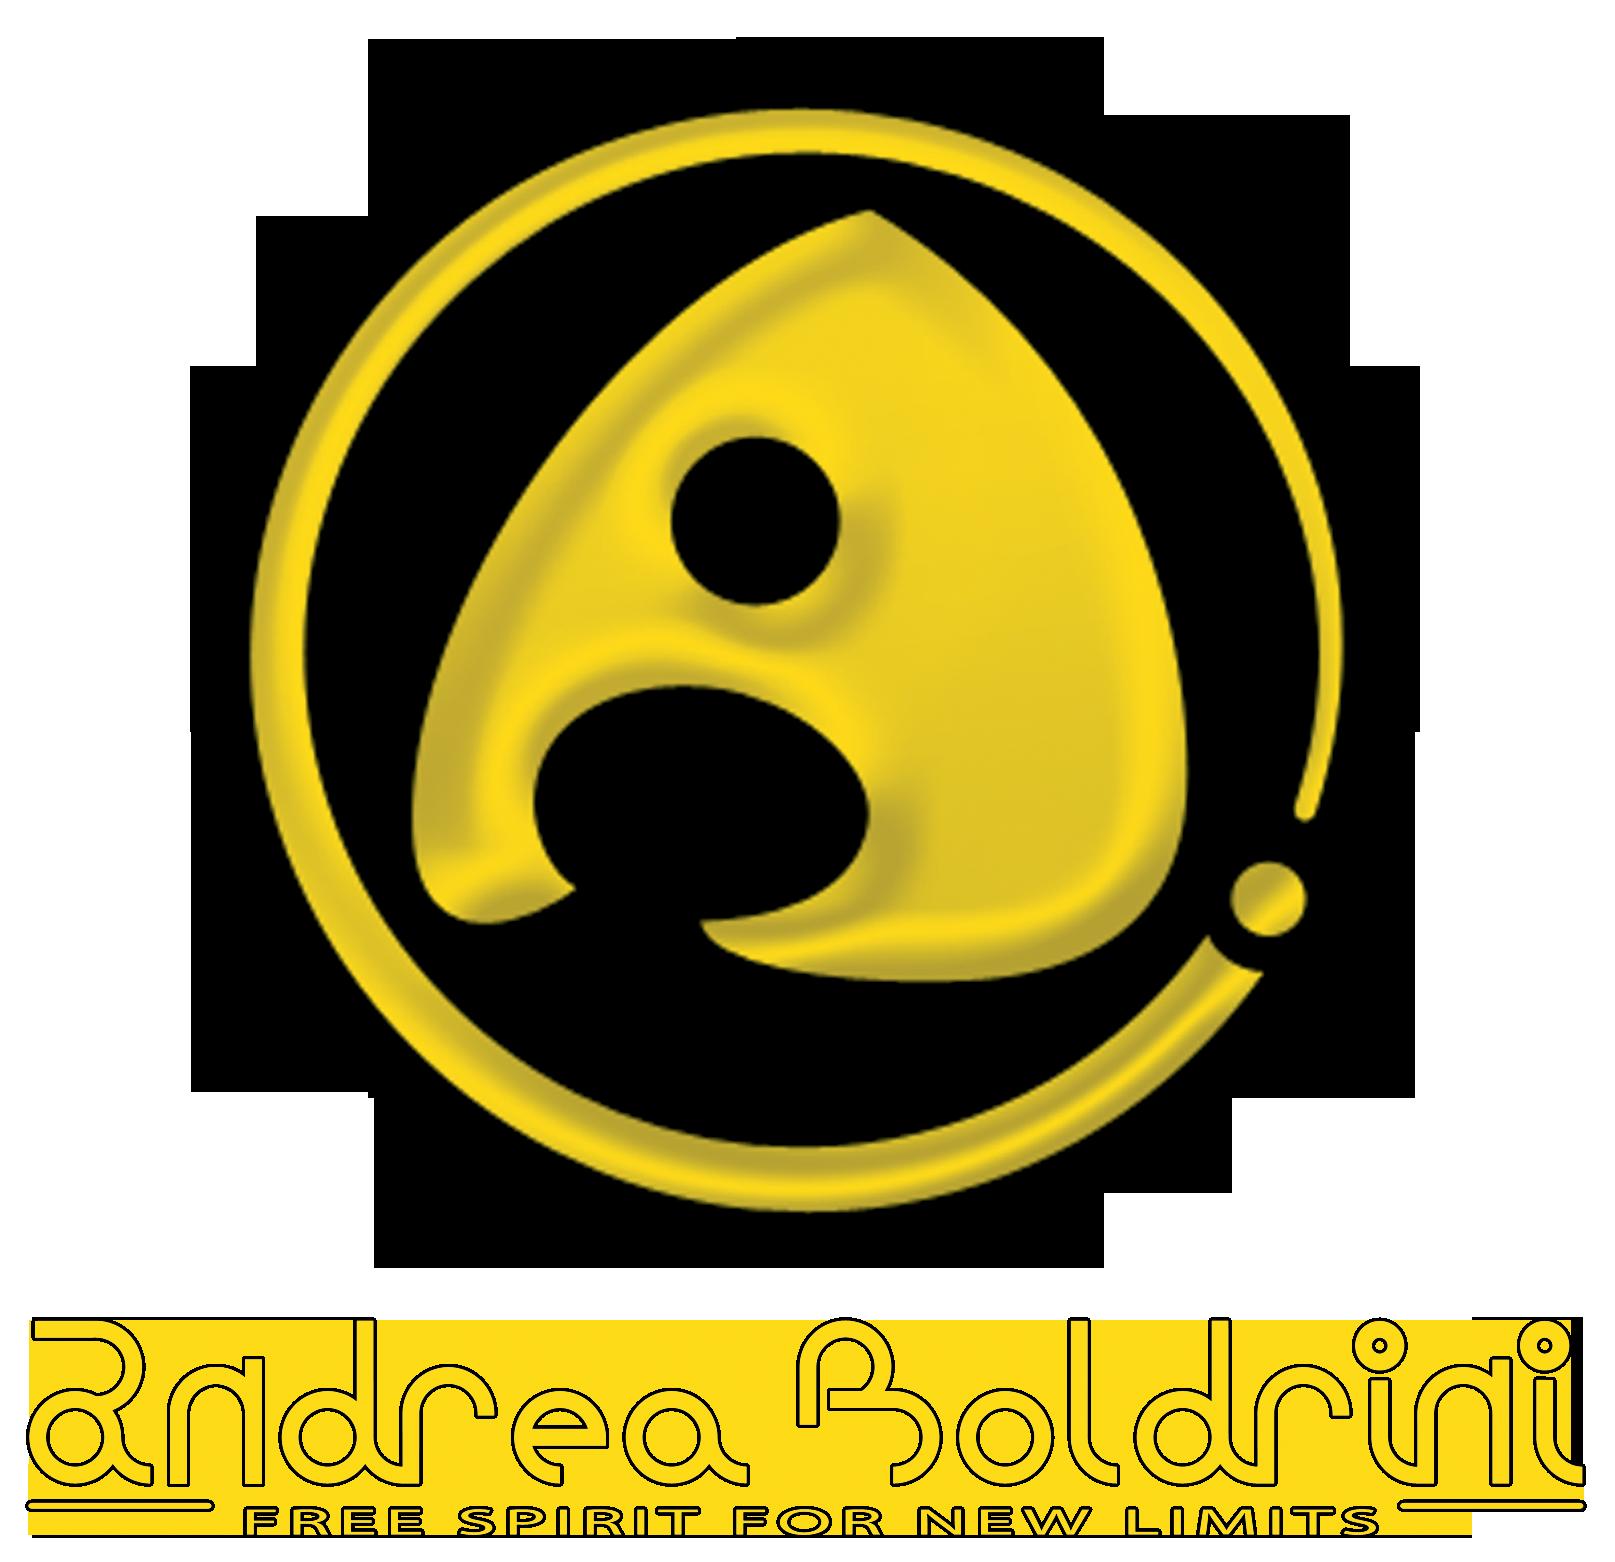 Andrea Boldrini